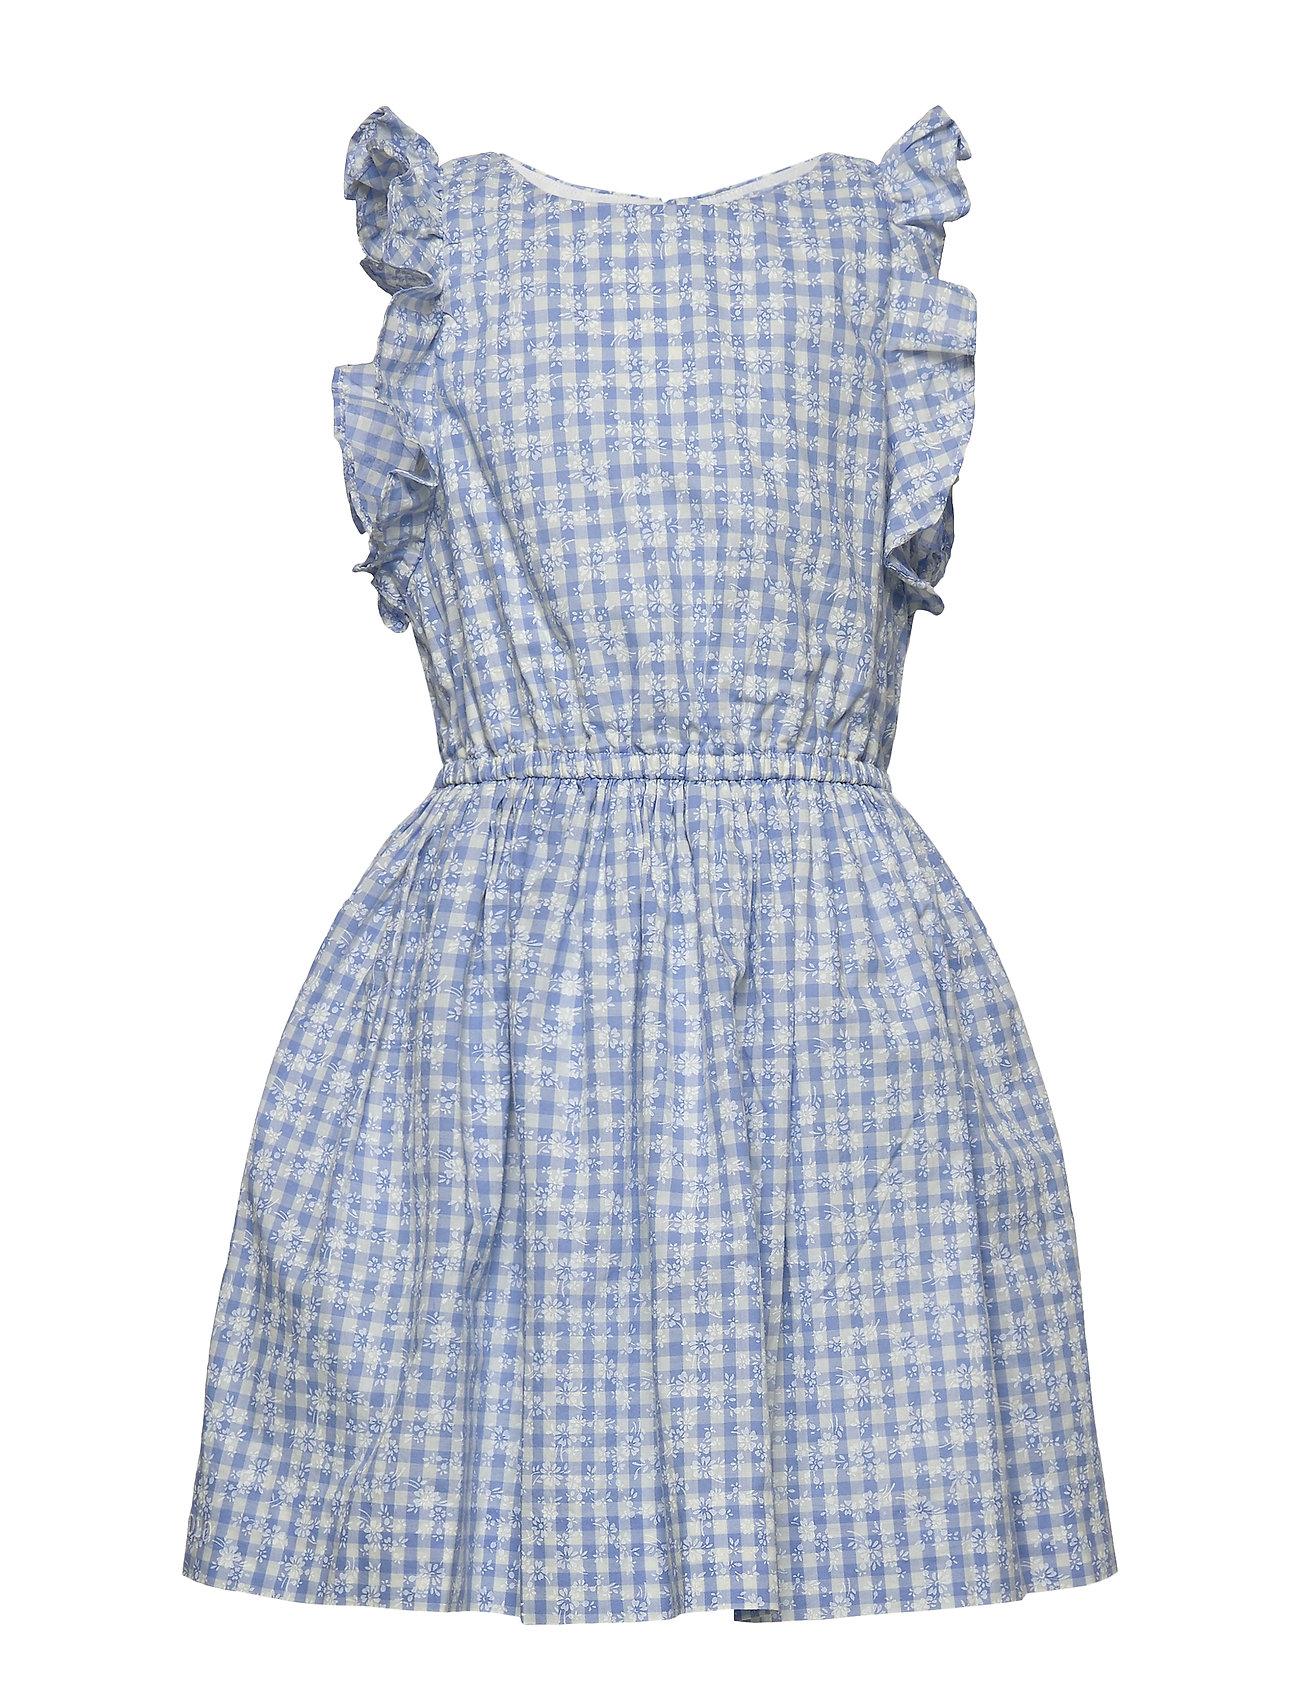 Ralph Lauren Kids Gingham Cotton Poplin Dress - BLUE MULTI